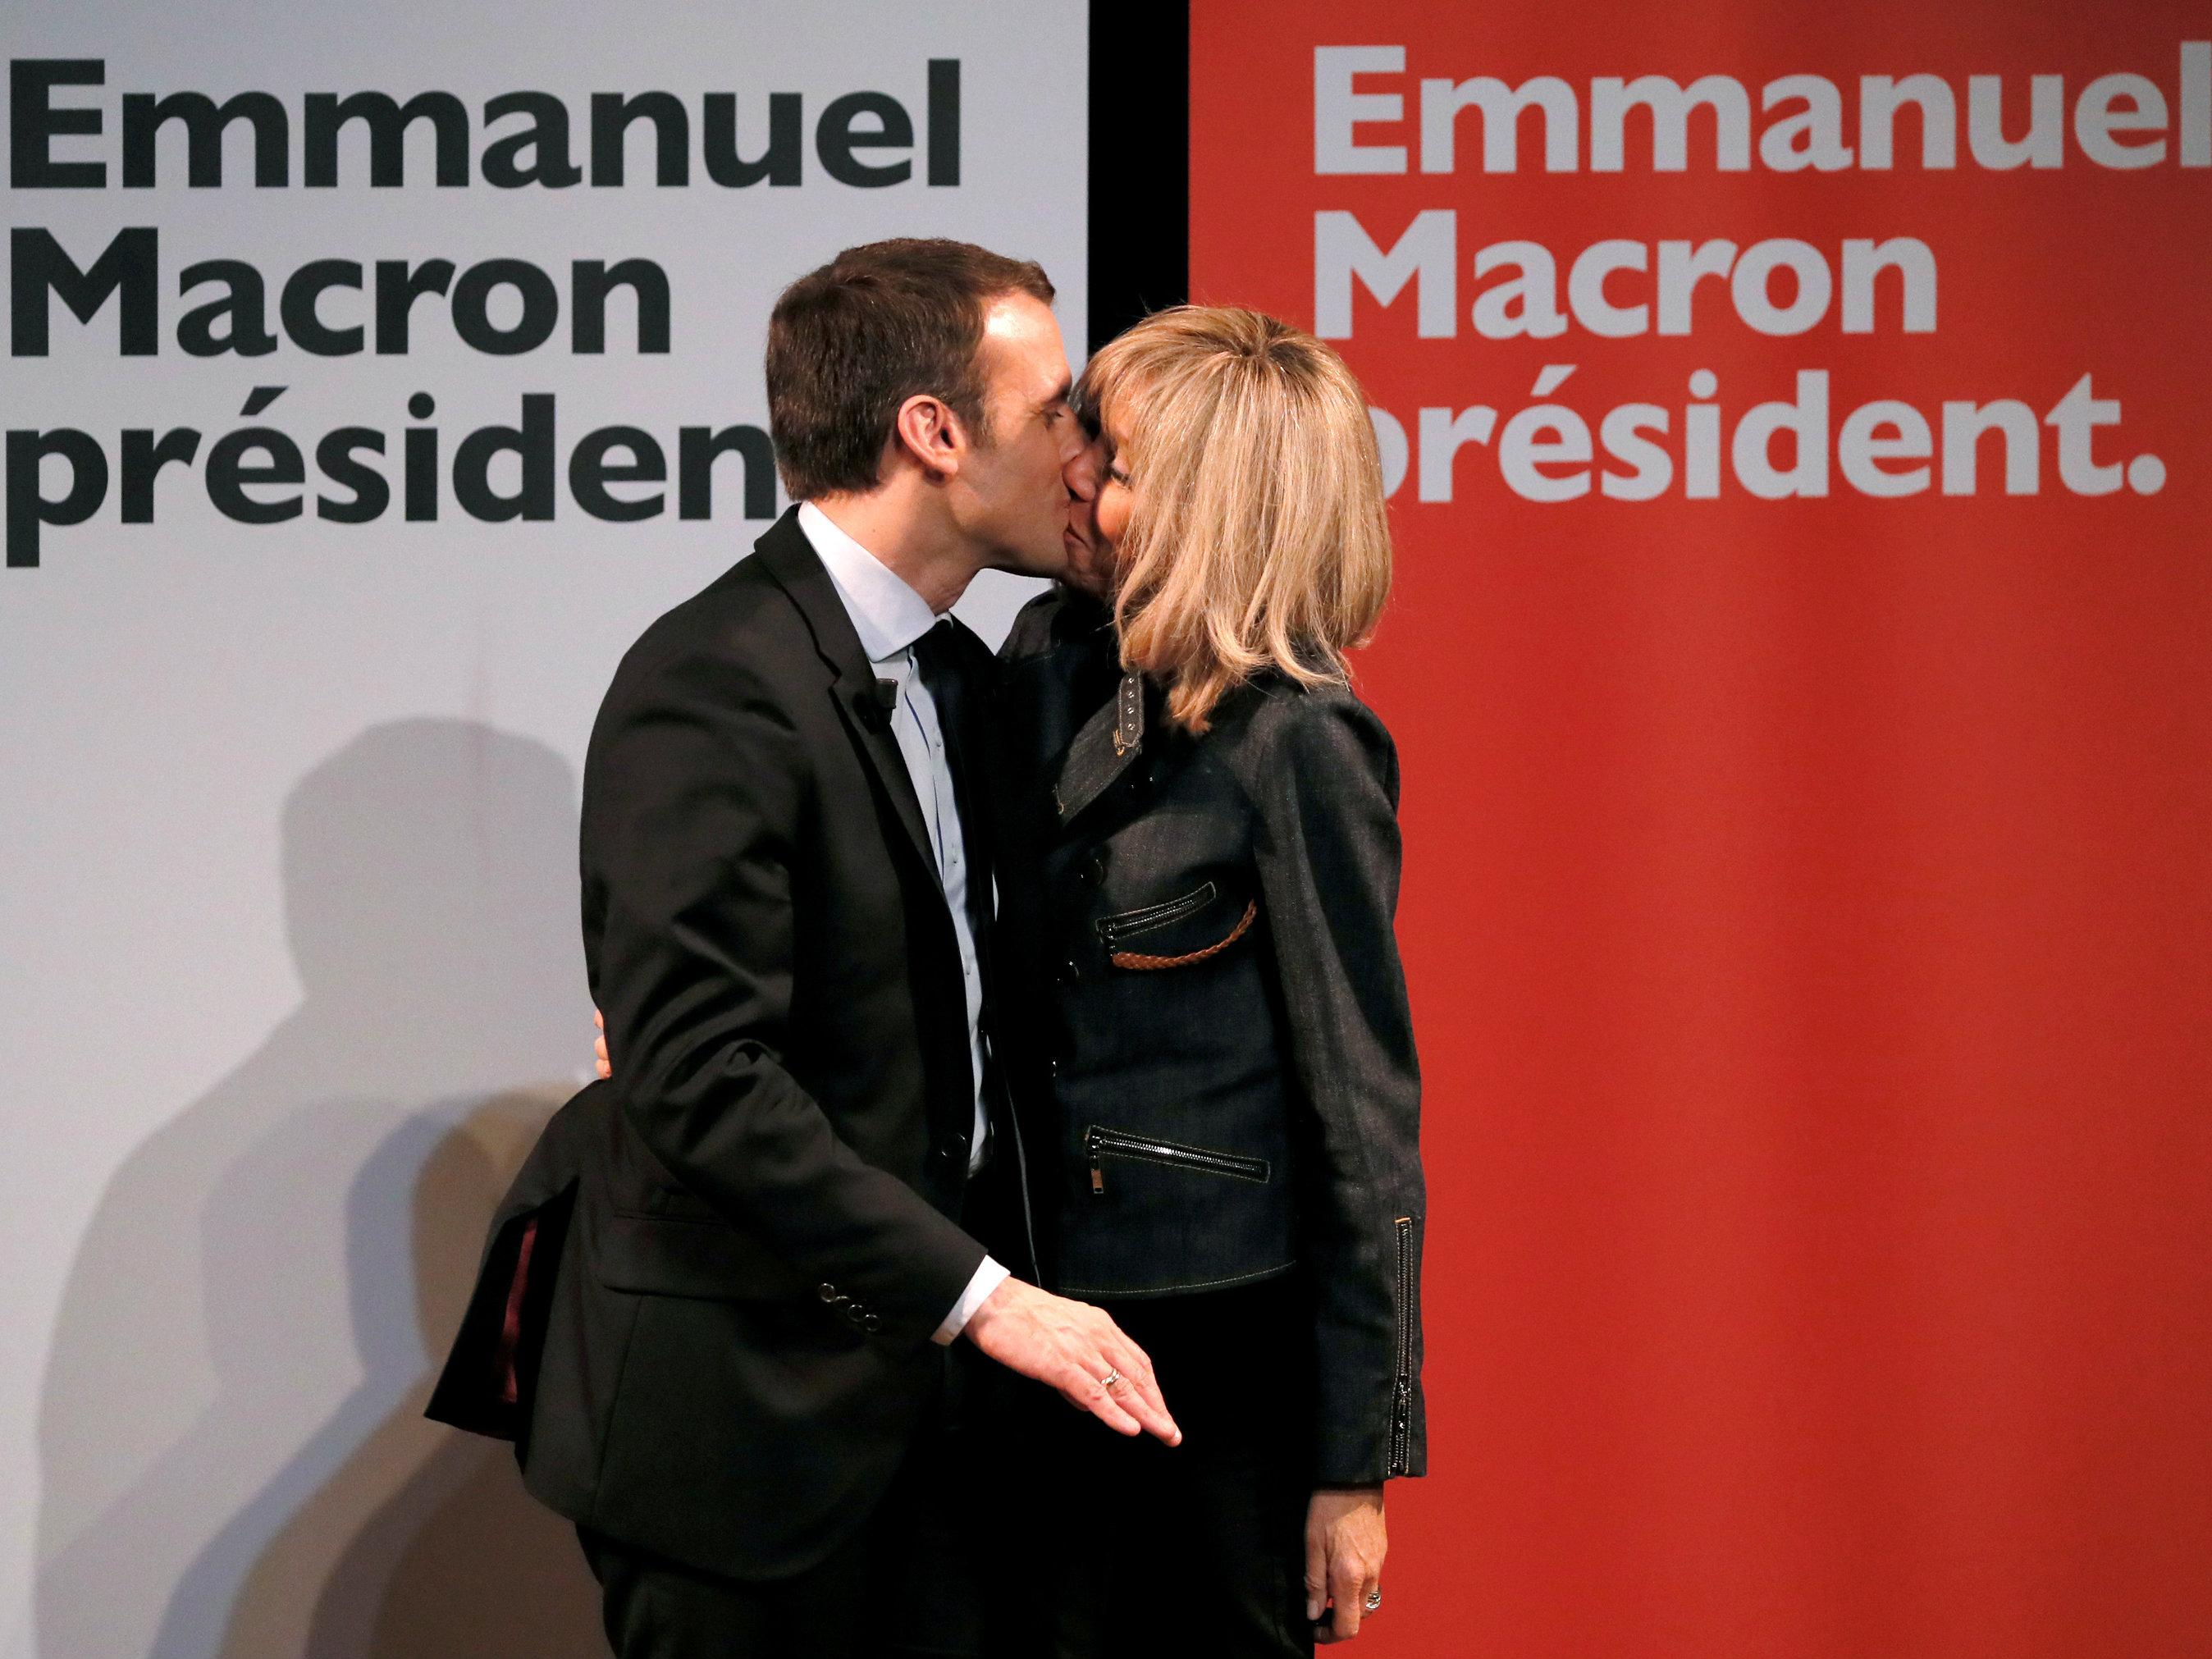 Emmanuel Macron S Wife Brigitte Macron Who Is 24 Years His Senior Is His Closest Political Advisor Quartz